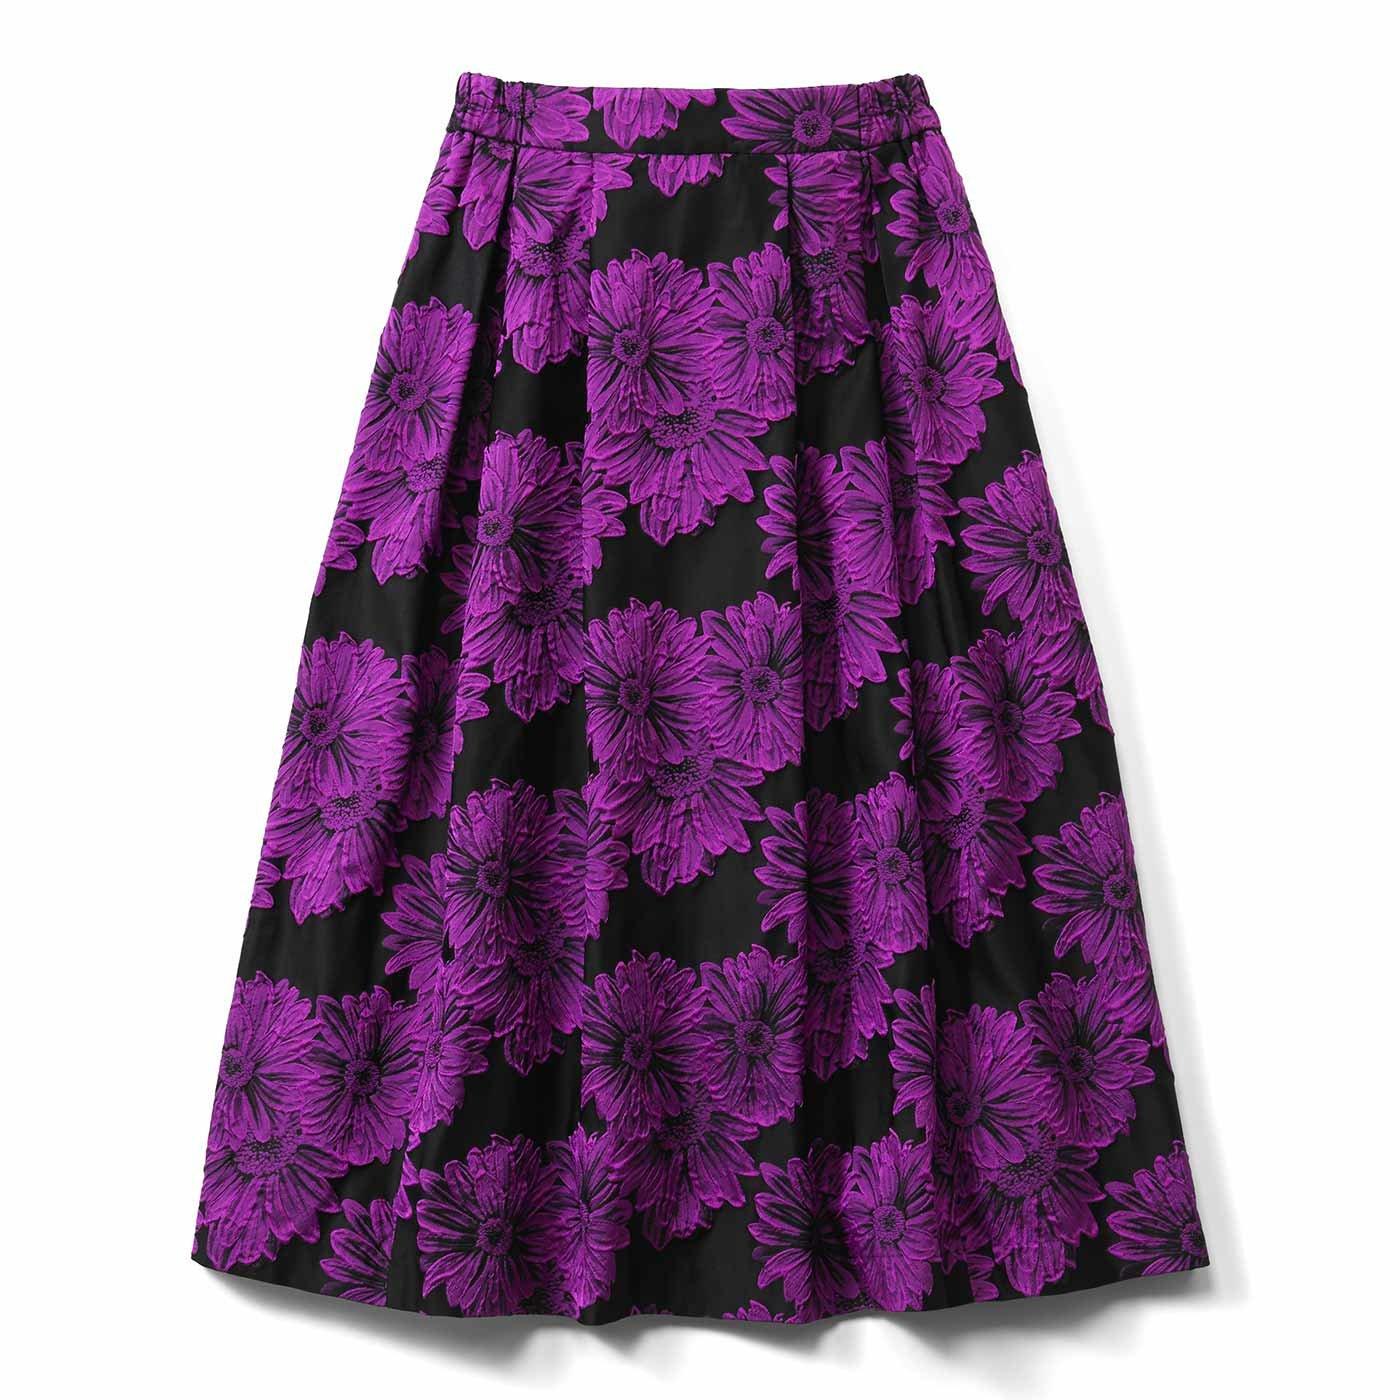 IEDIT[イディット] あったかインナーパンツ付き 華やぎジャカードスカート〈ピンク〉